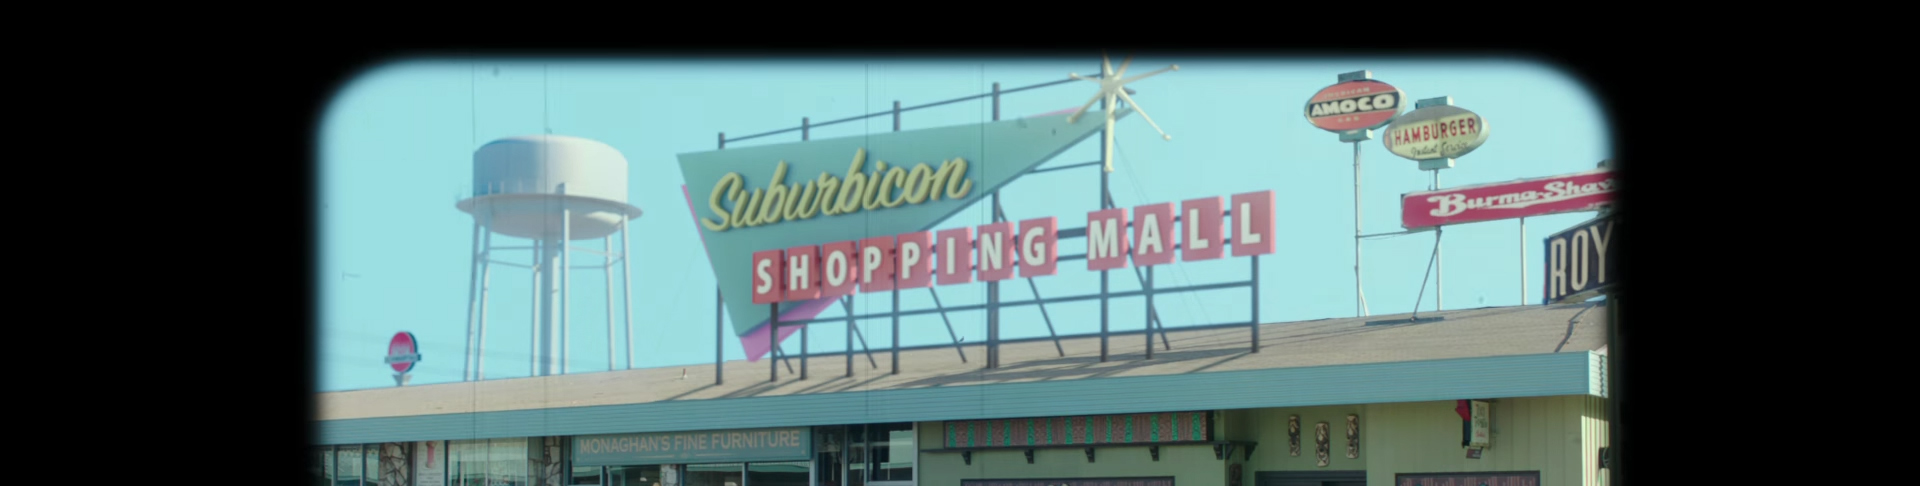 Suburbicon. Image Credit: Paramount.